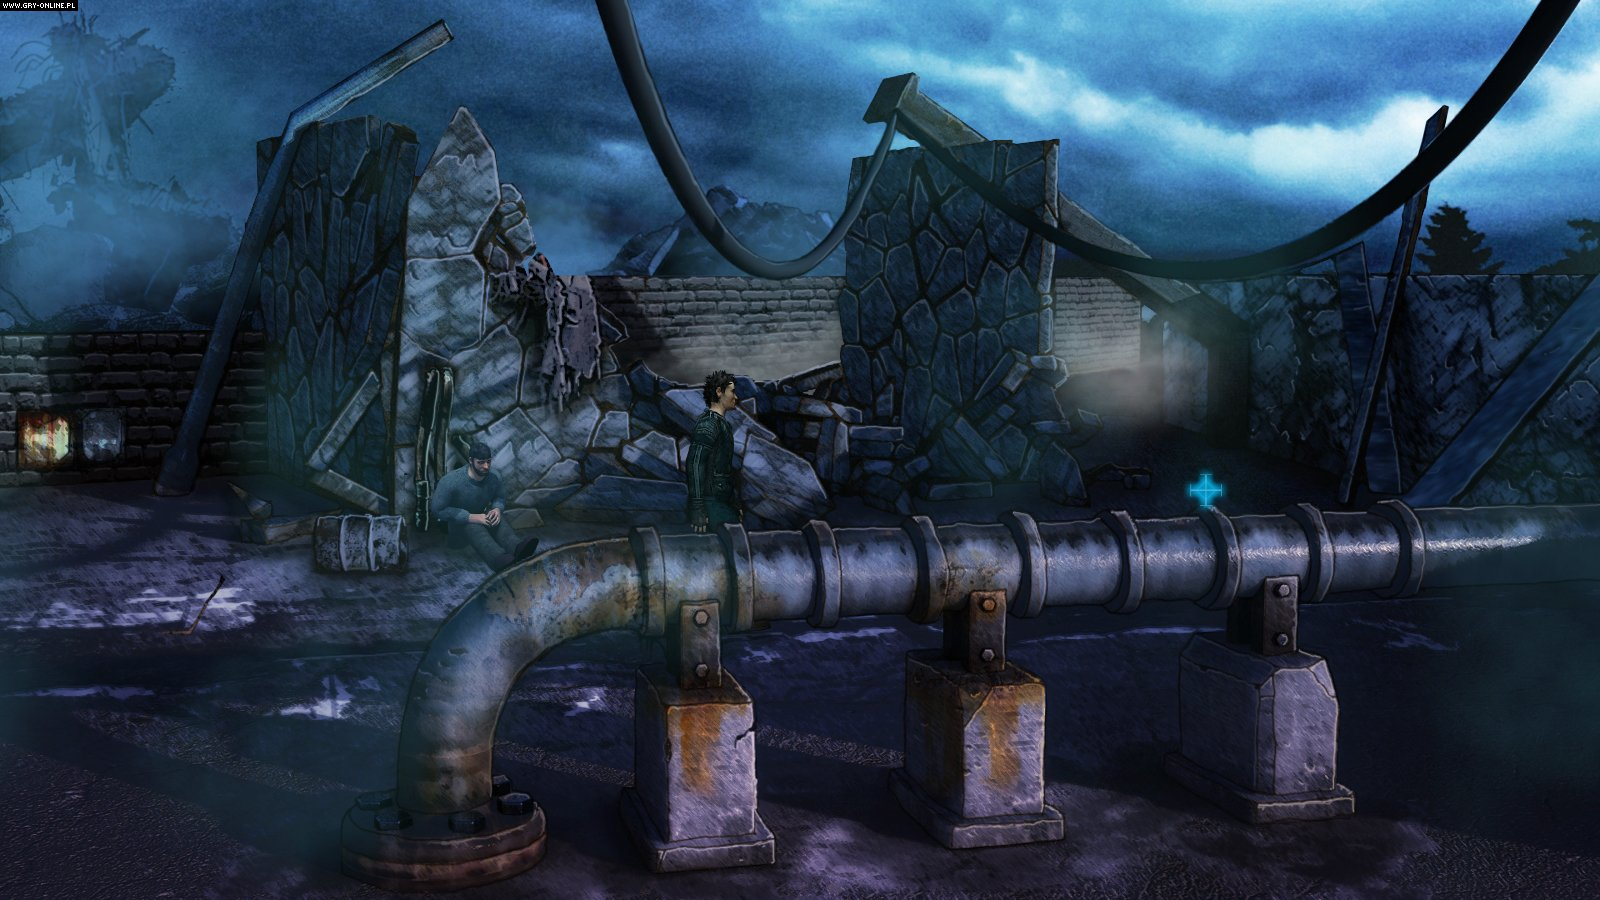 Shadow Of Nebula PC Games Image 7/7, Bisonia